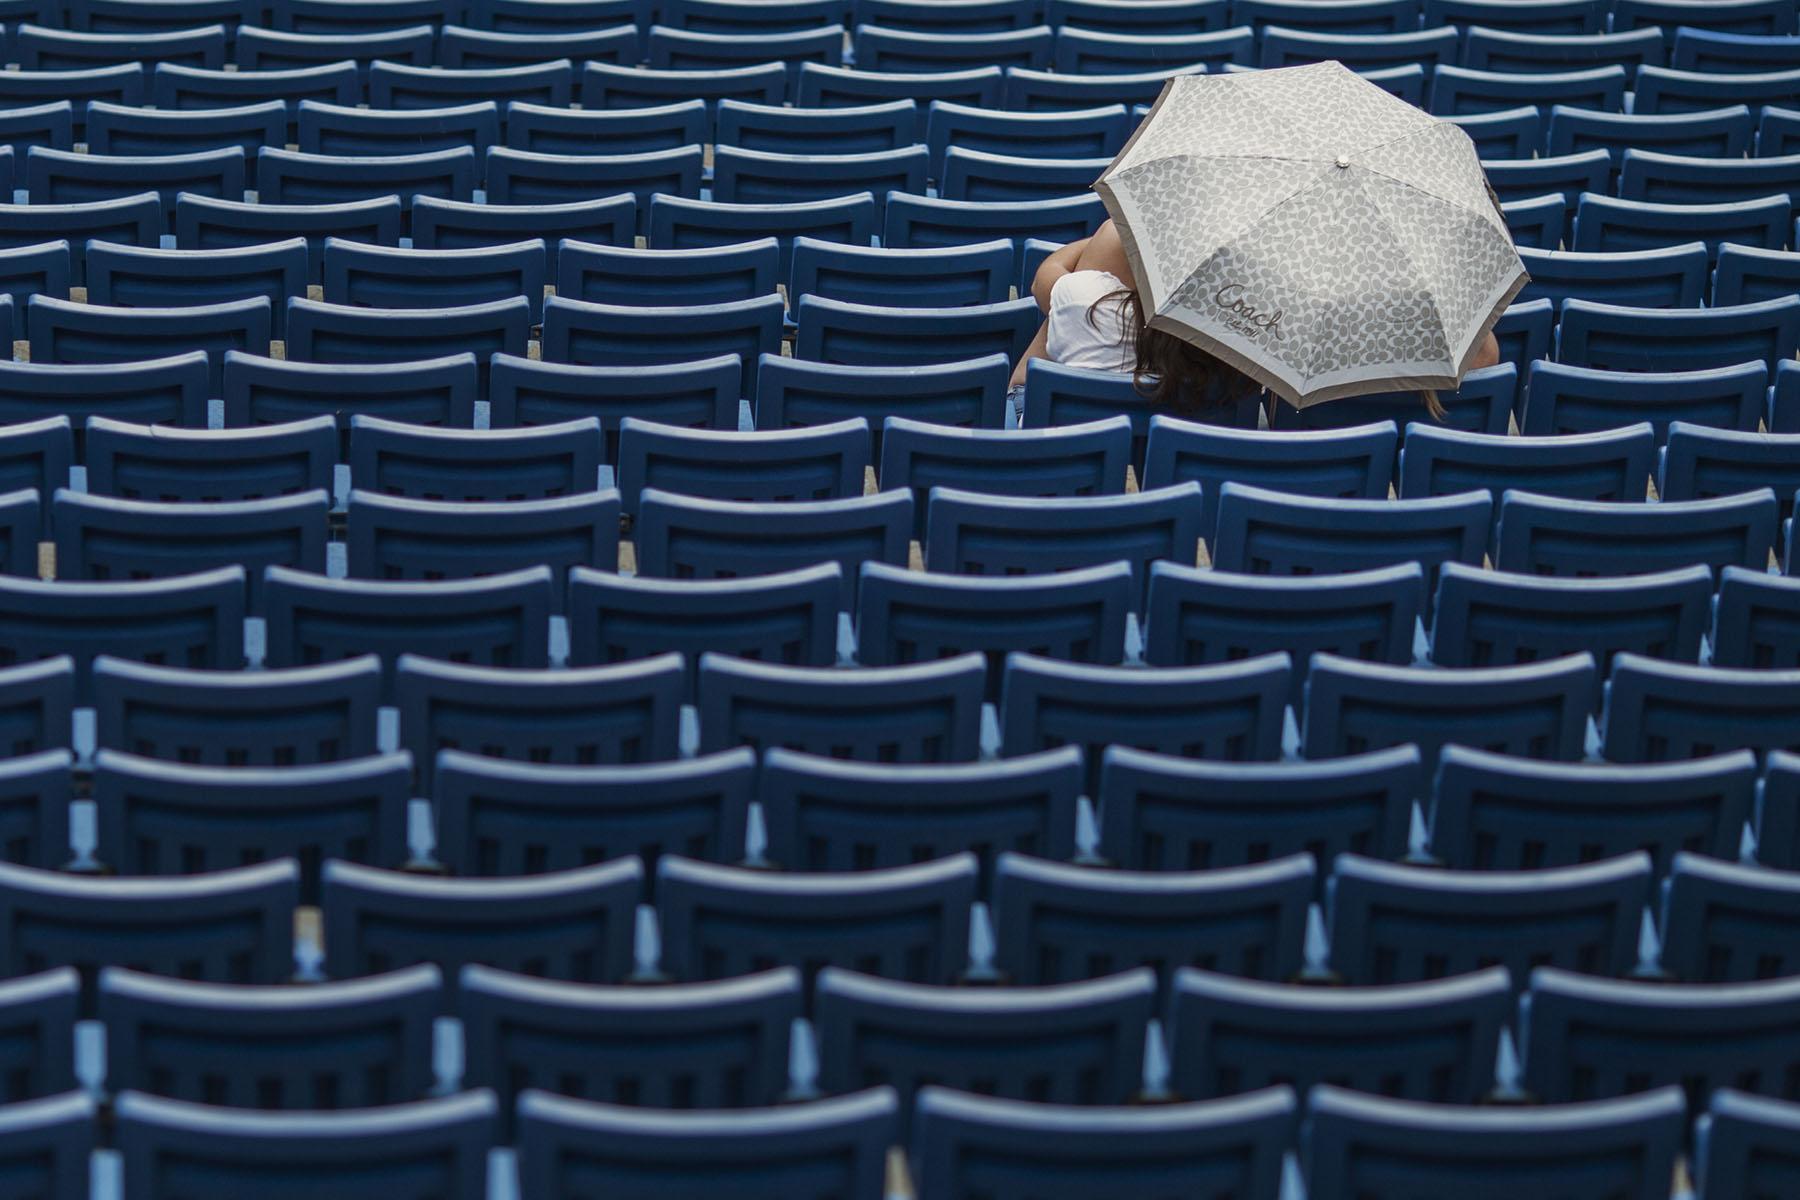 Rain at the Stadium